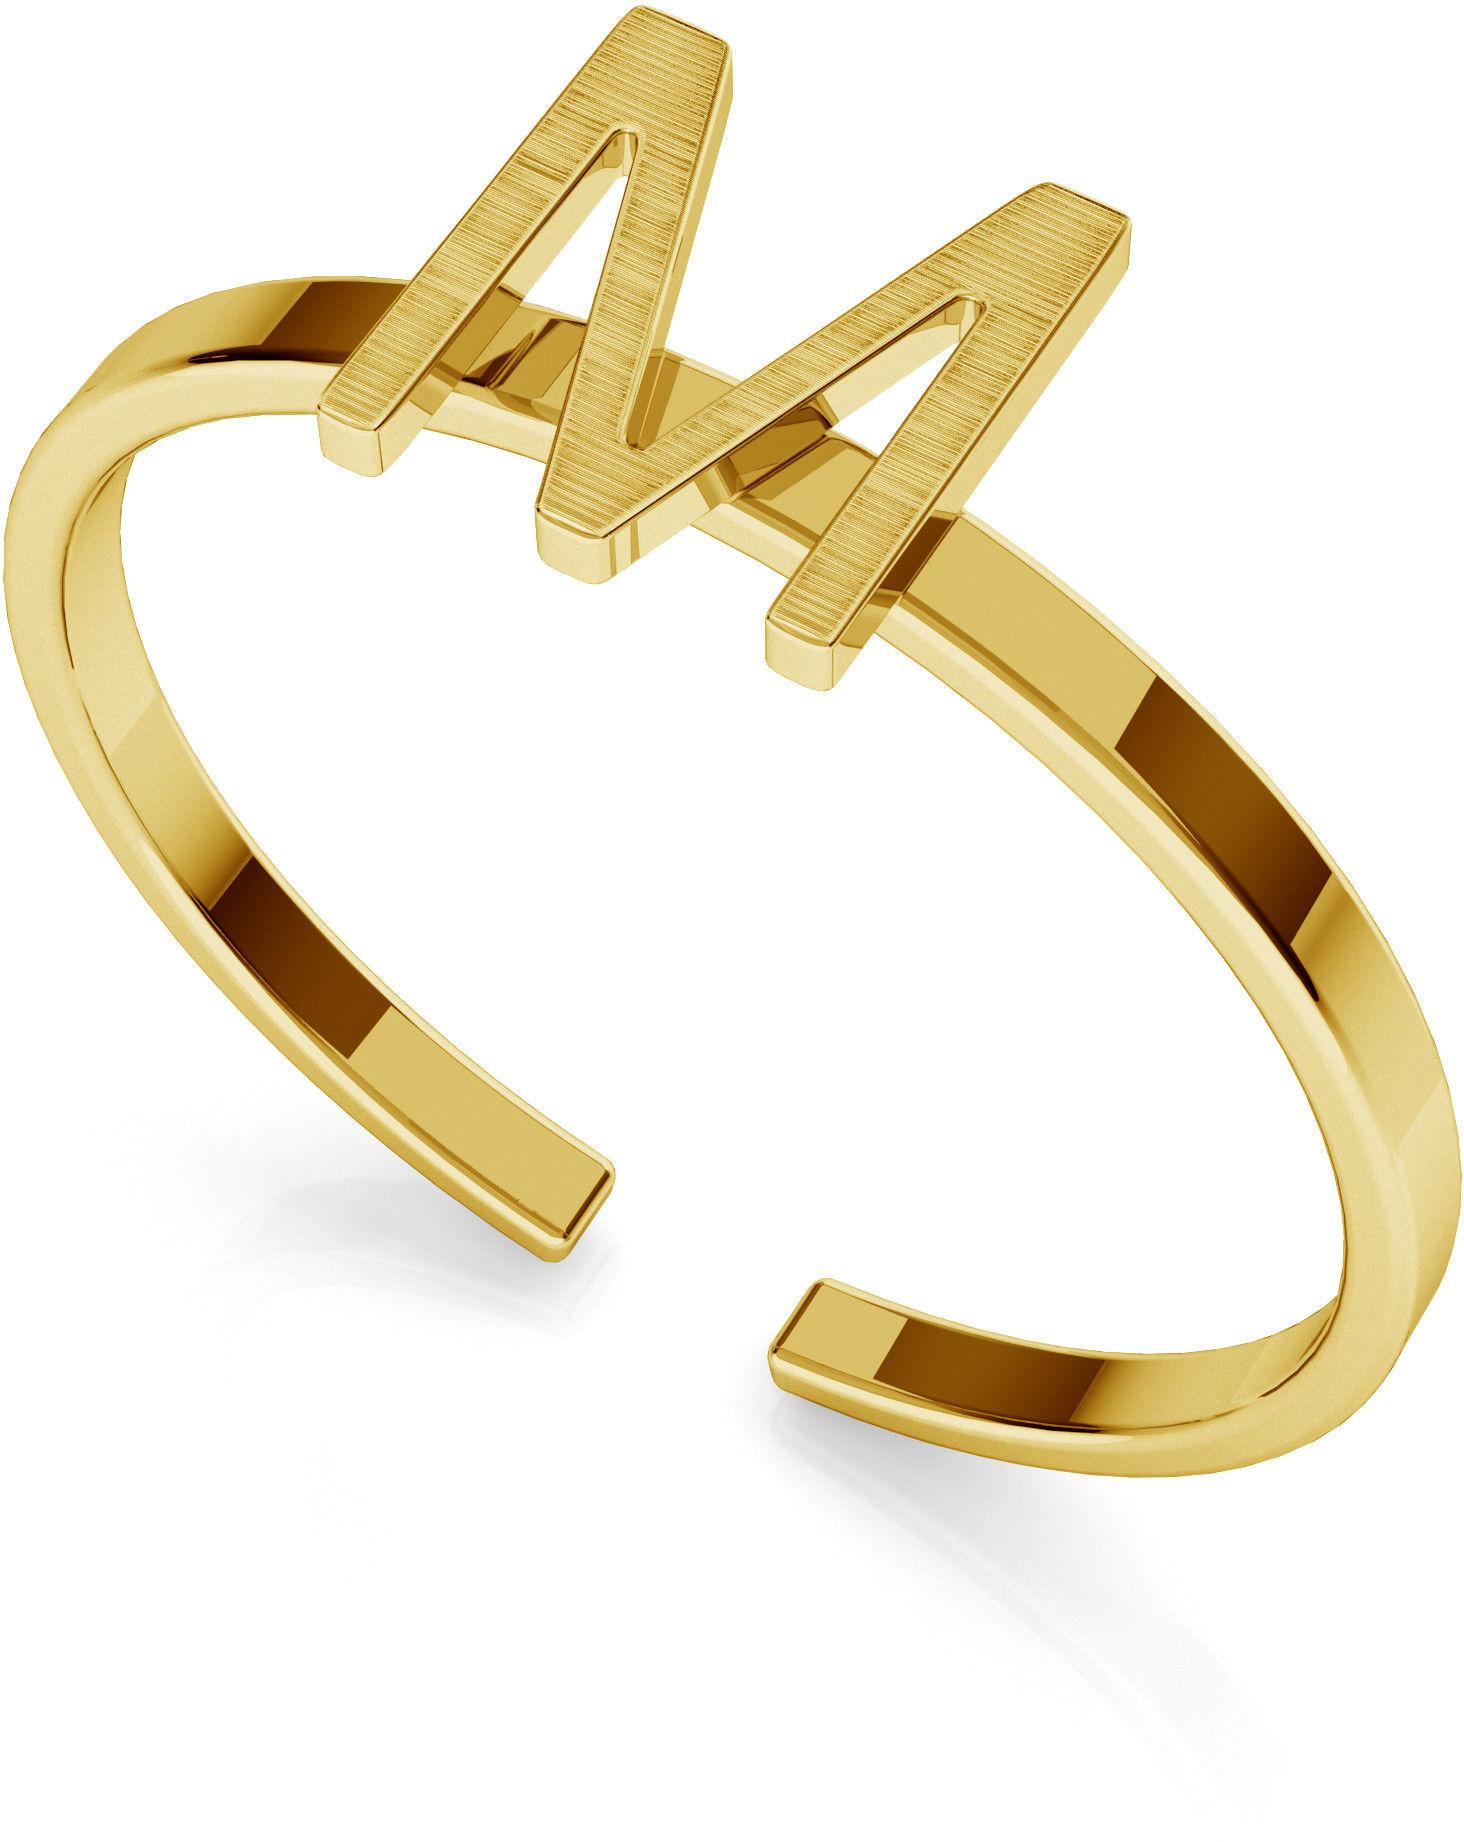 Srebrny pierścionek z literką My RING, srebro 925 : Litera - C, Srebro - kolor pokrycia - Pokrycie żółtym 18K złotem